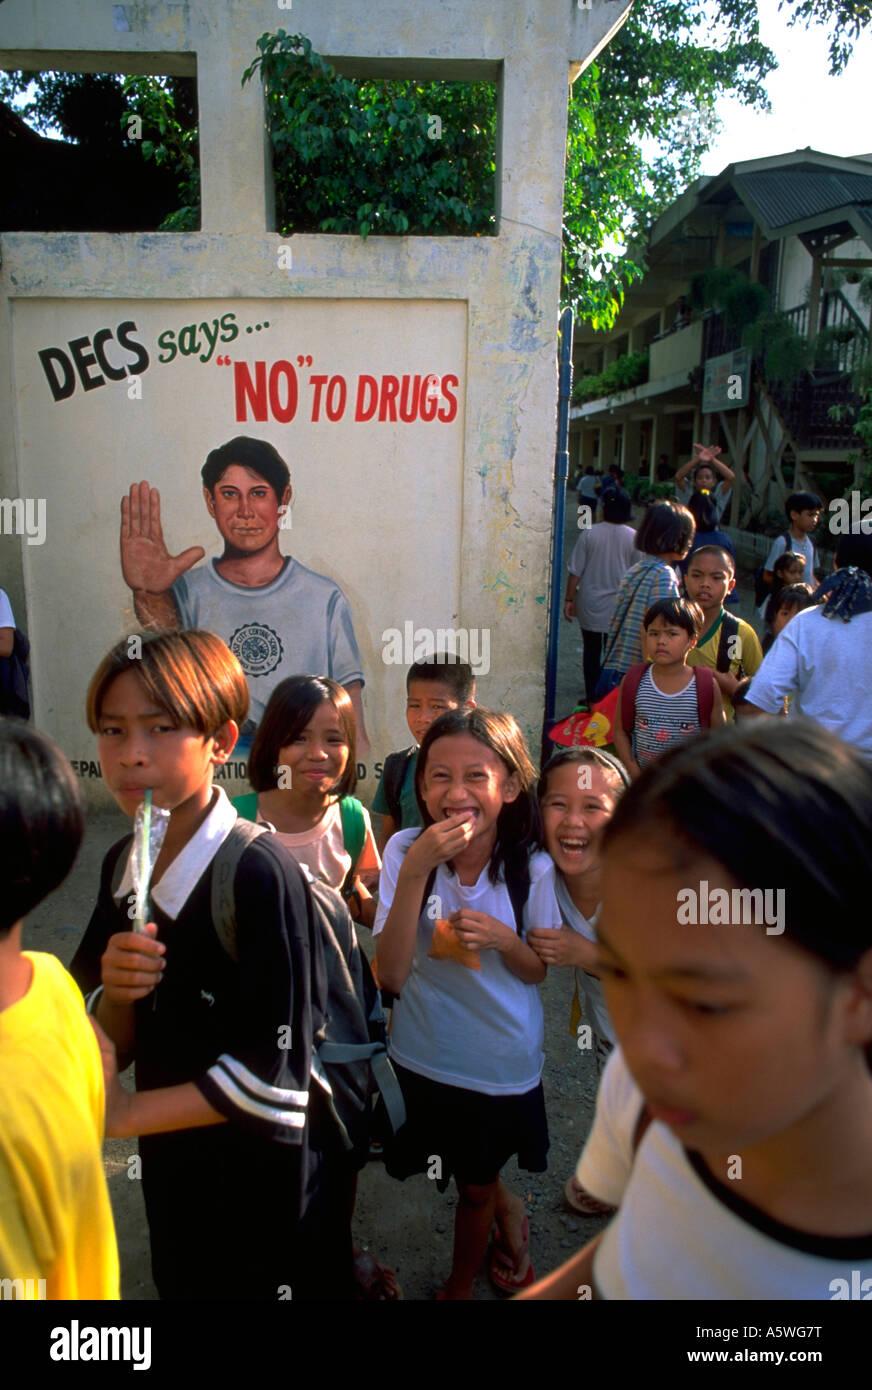 Painet hl0226 school children kids oro cagayon mindinao philippines l'adolescence drogue wonder rire l'éducation Photo Stock